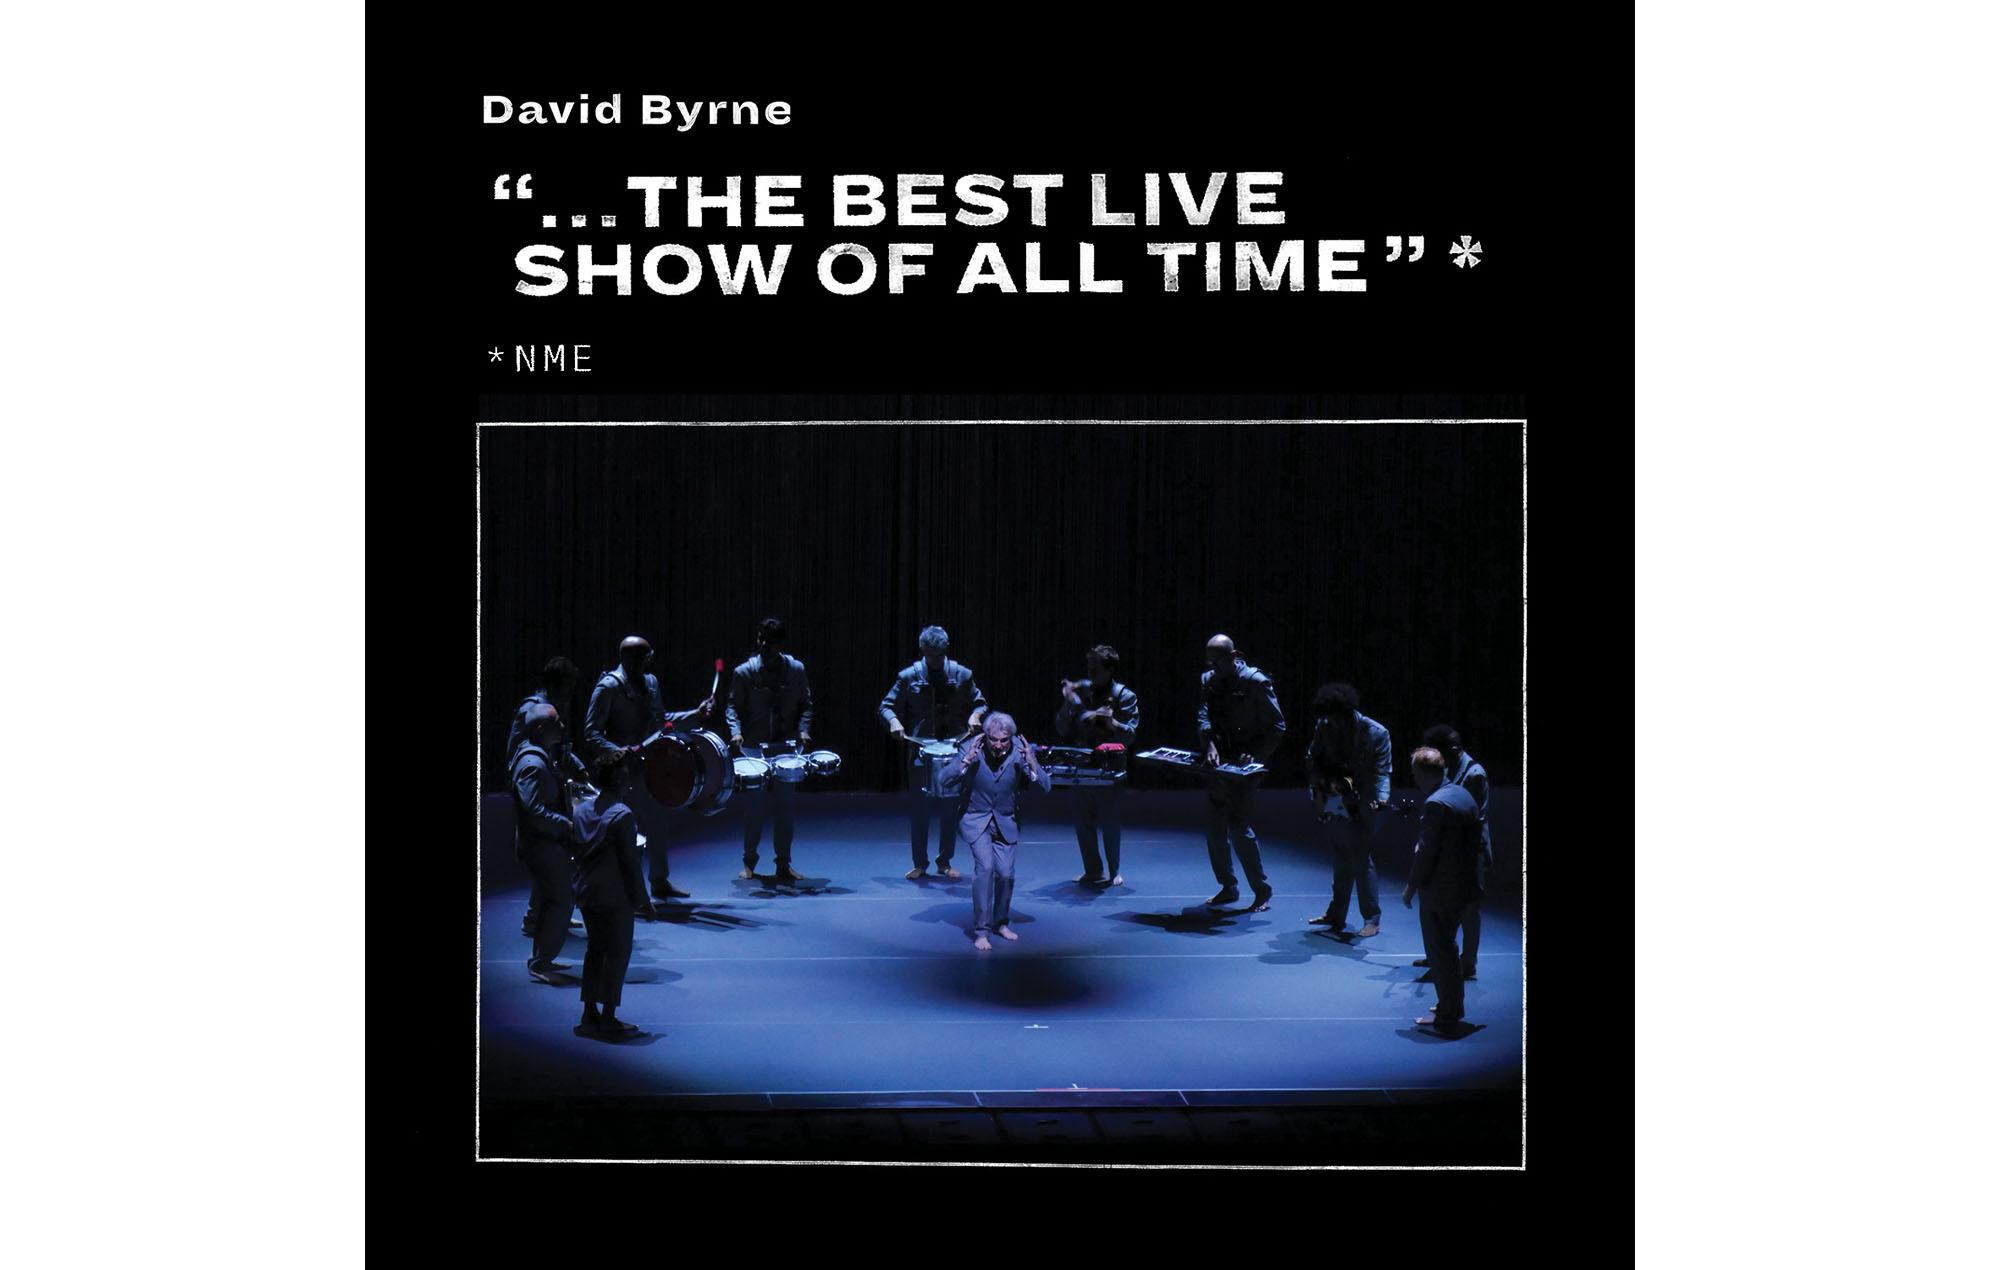 """THE BEST LIVE SHOW OF ALL TIME"" ES EL NUEVO EP DE DAVID BYRNE"